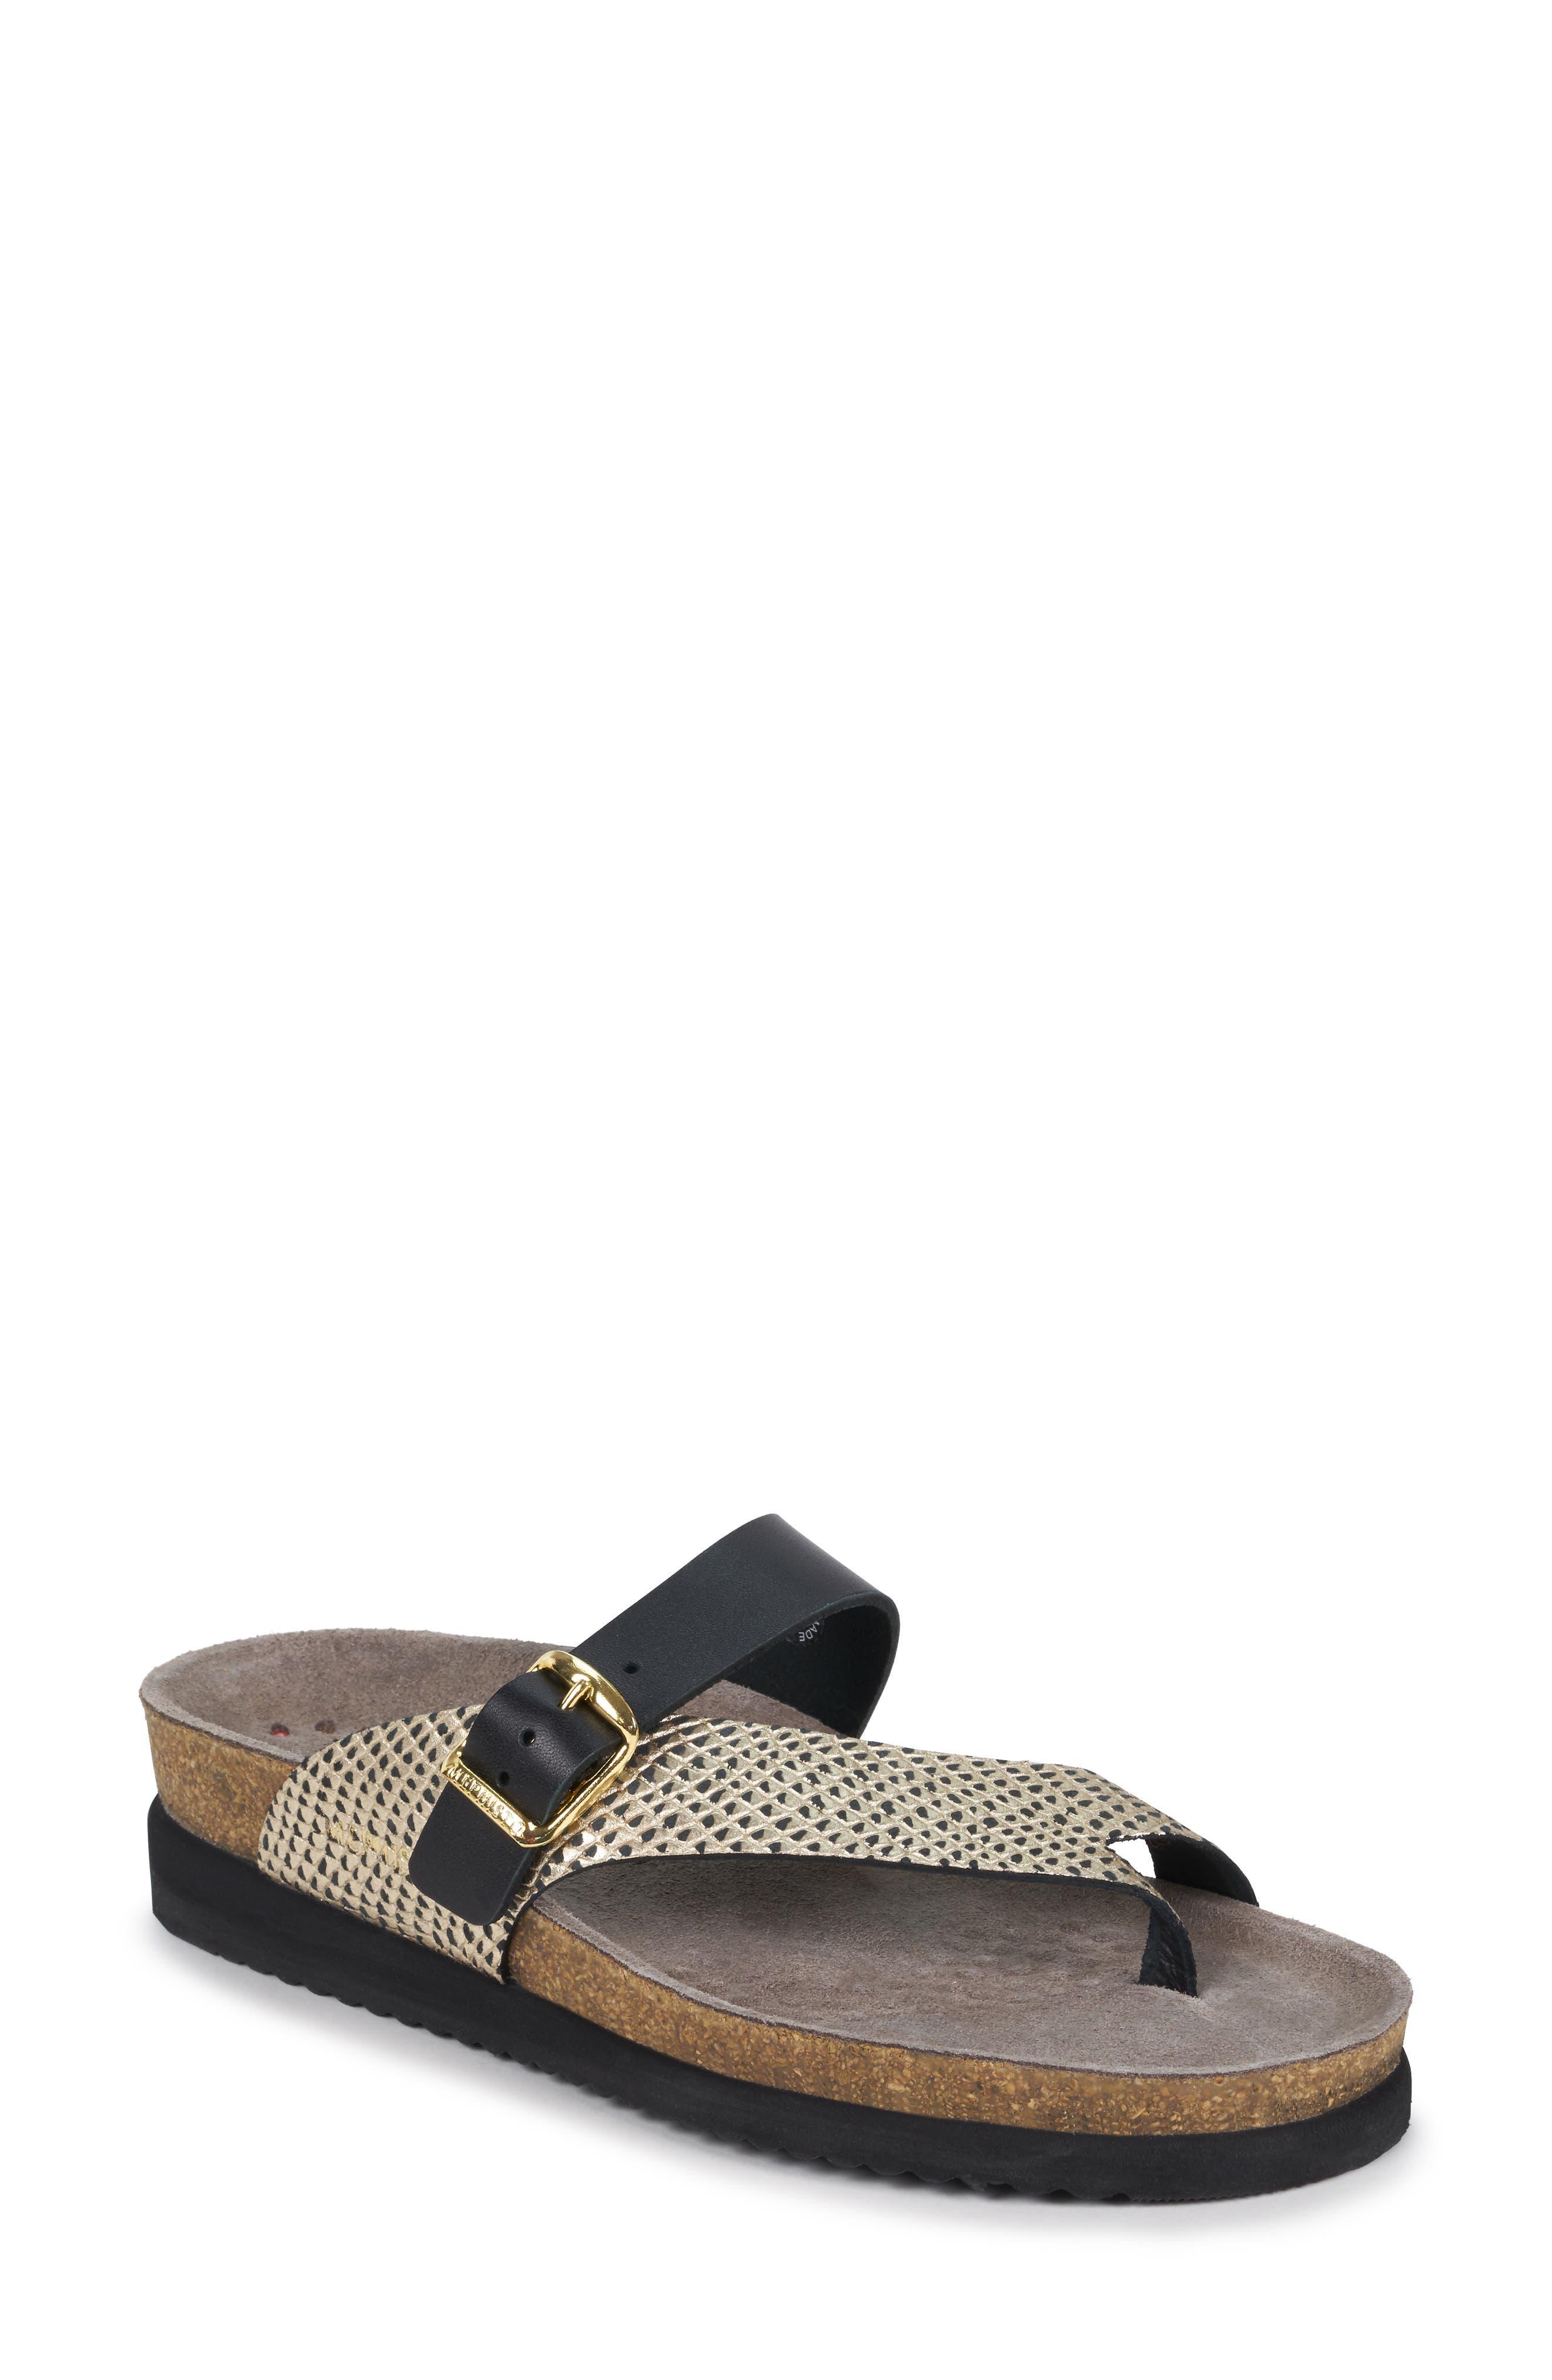 Helen Mix Sandal, Main, color, BLACK/ GOLD